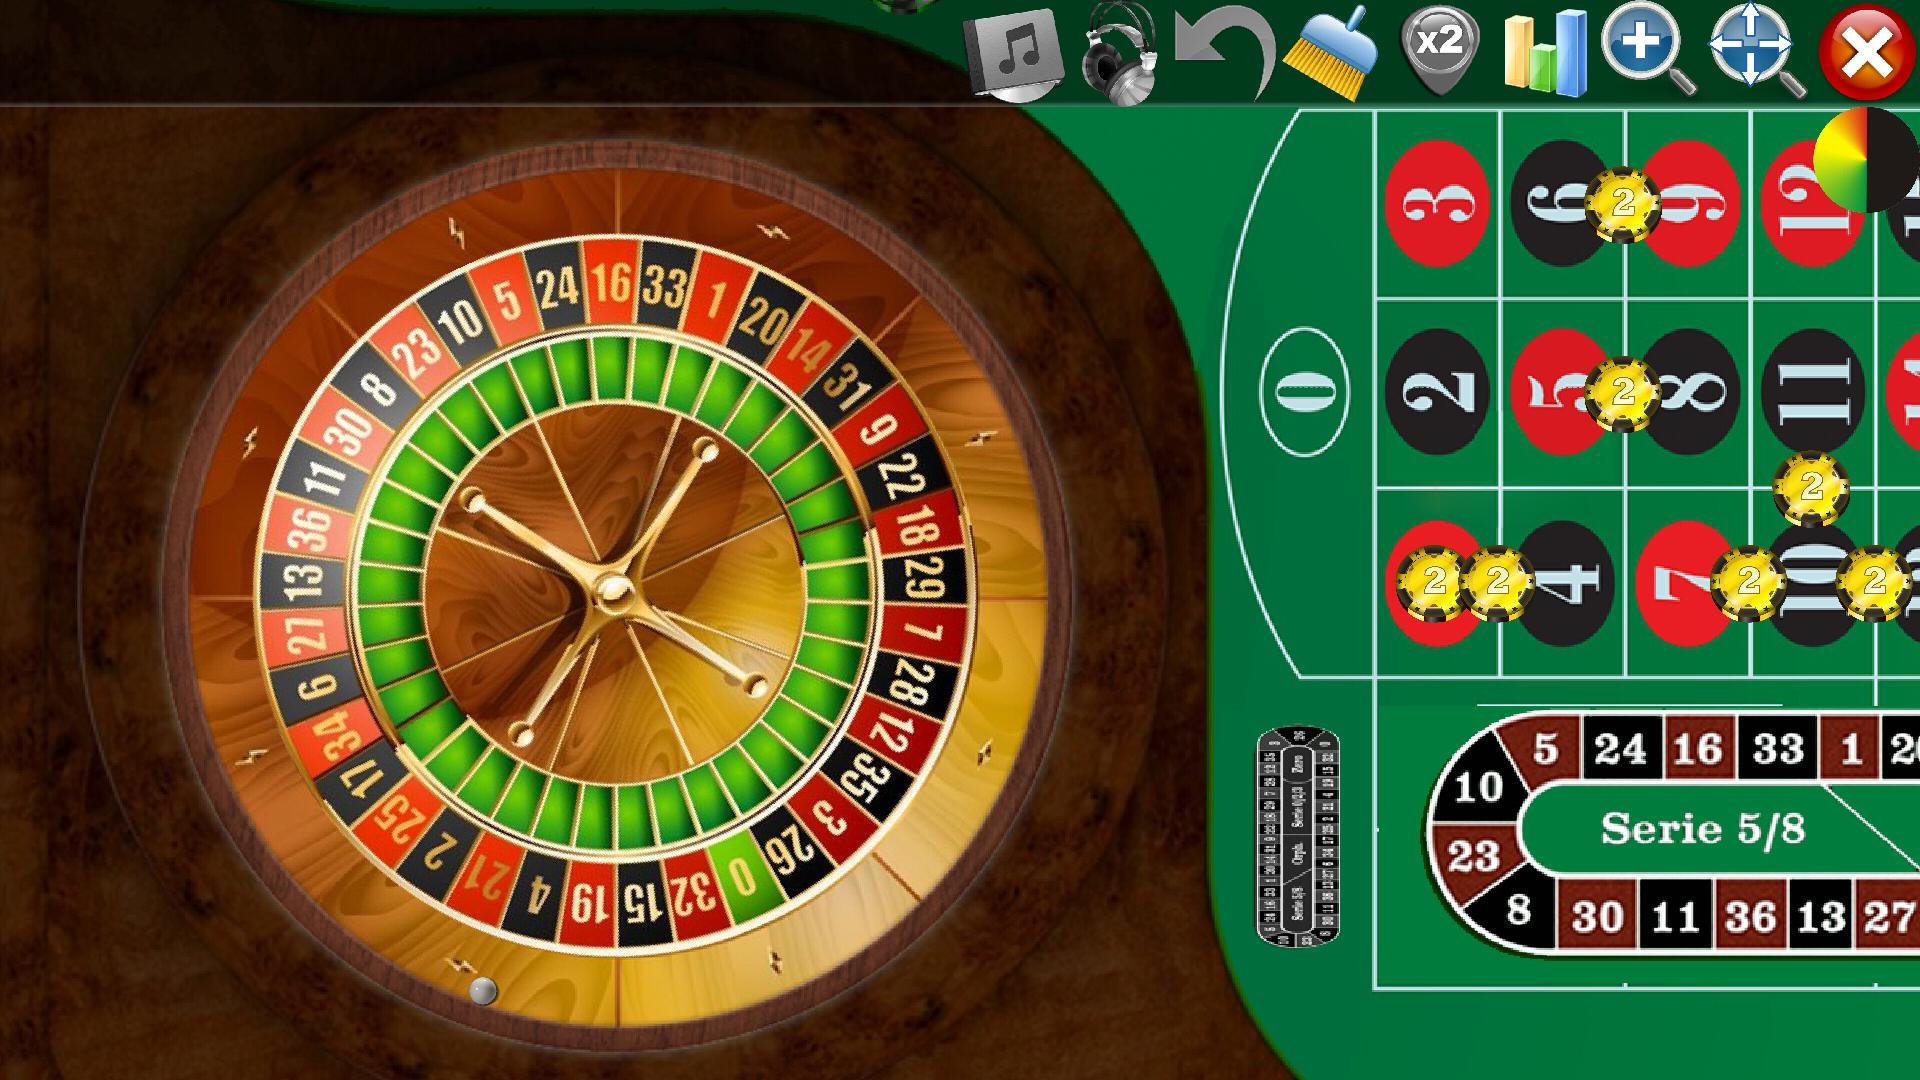 40 super hot slot casino free